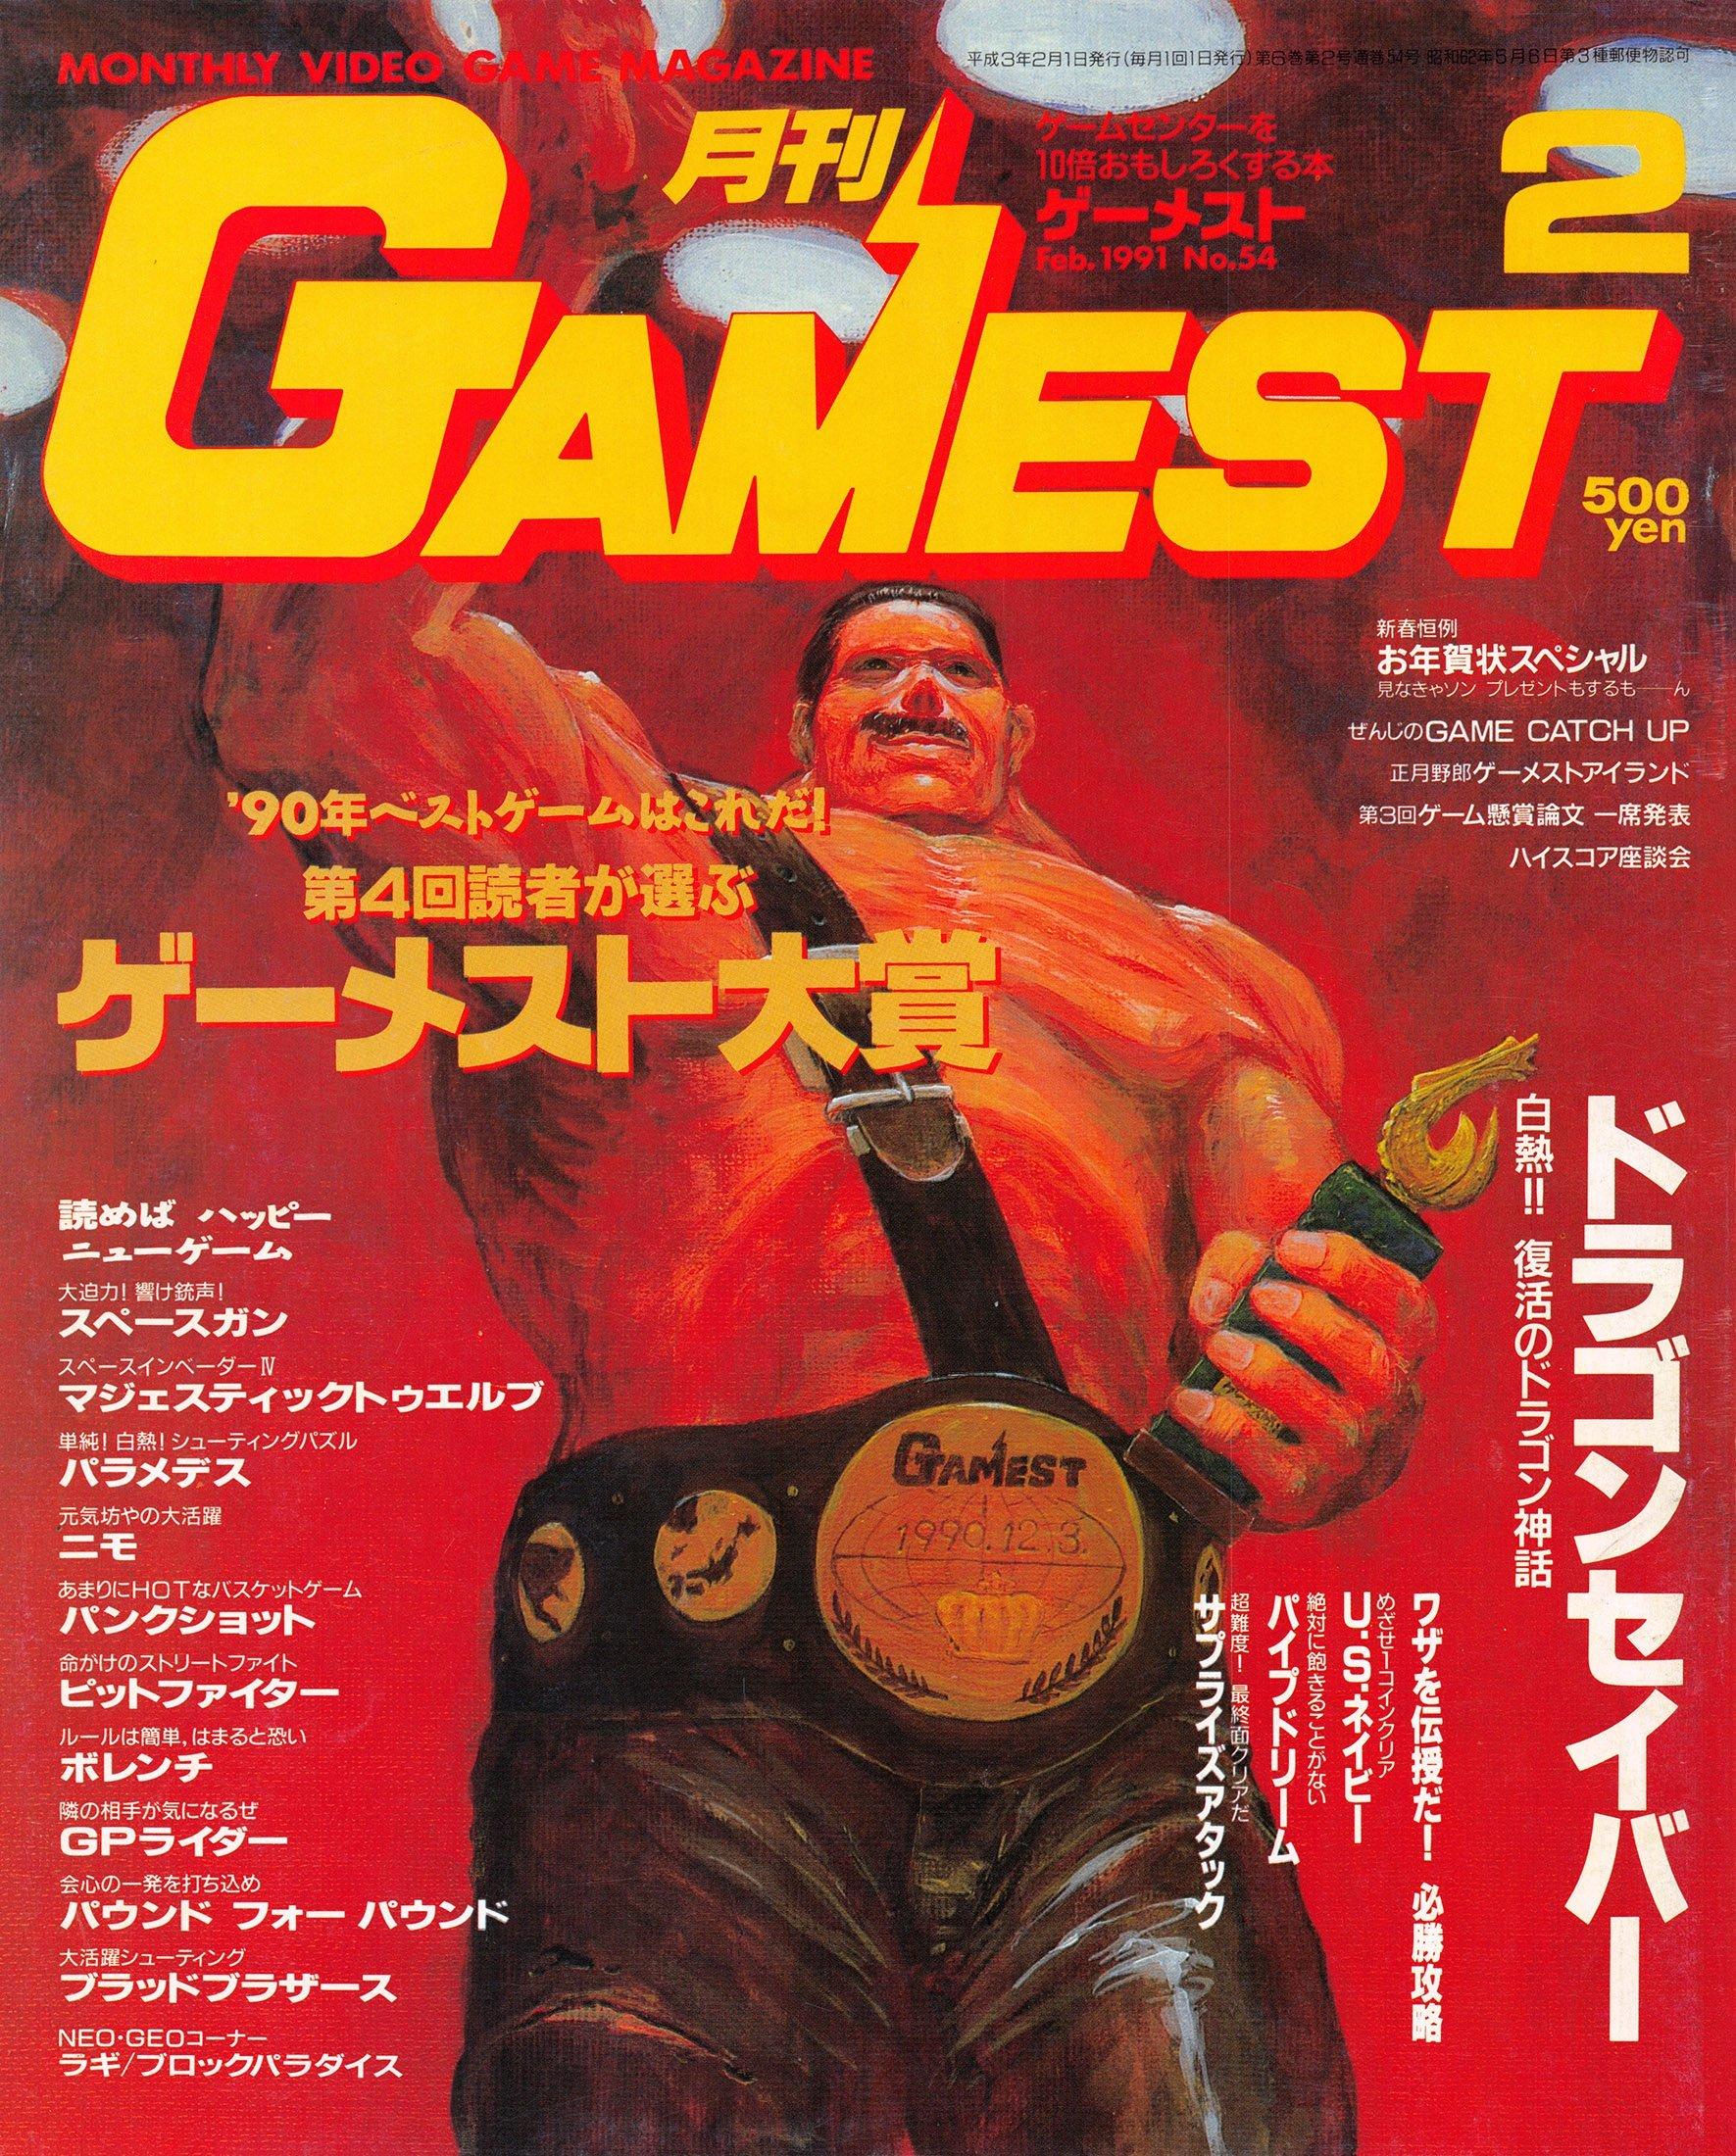 Gamest 054 (February 1991)